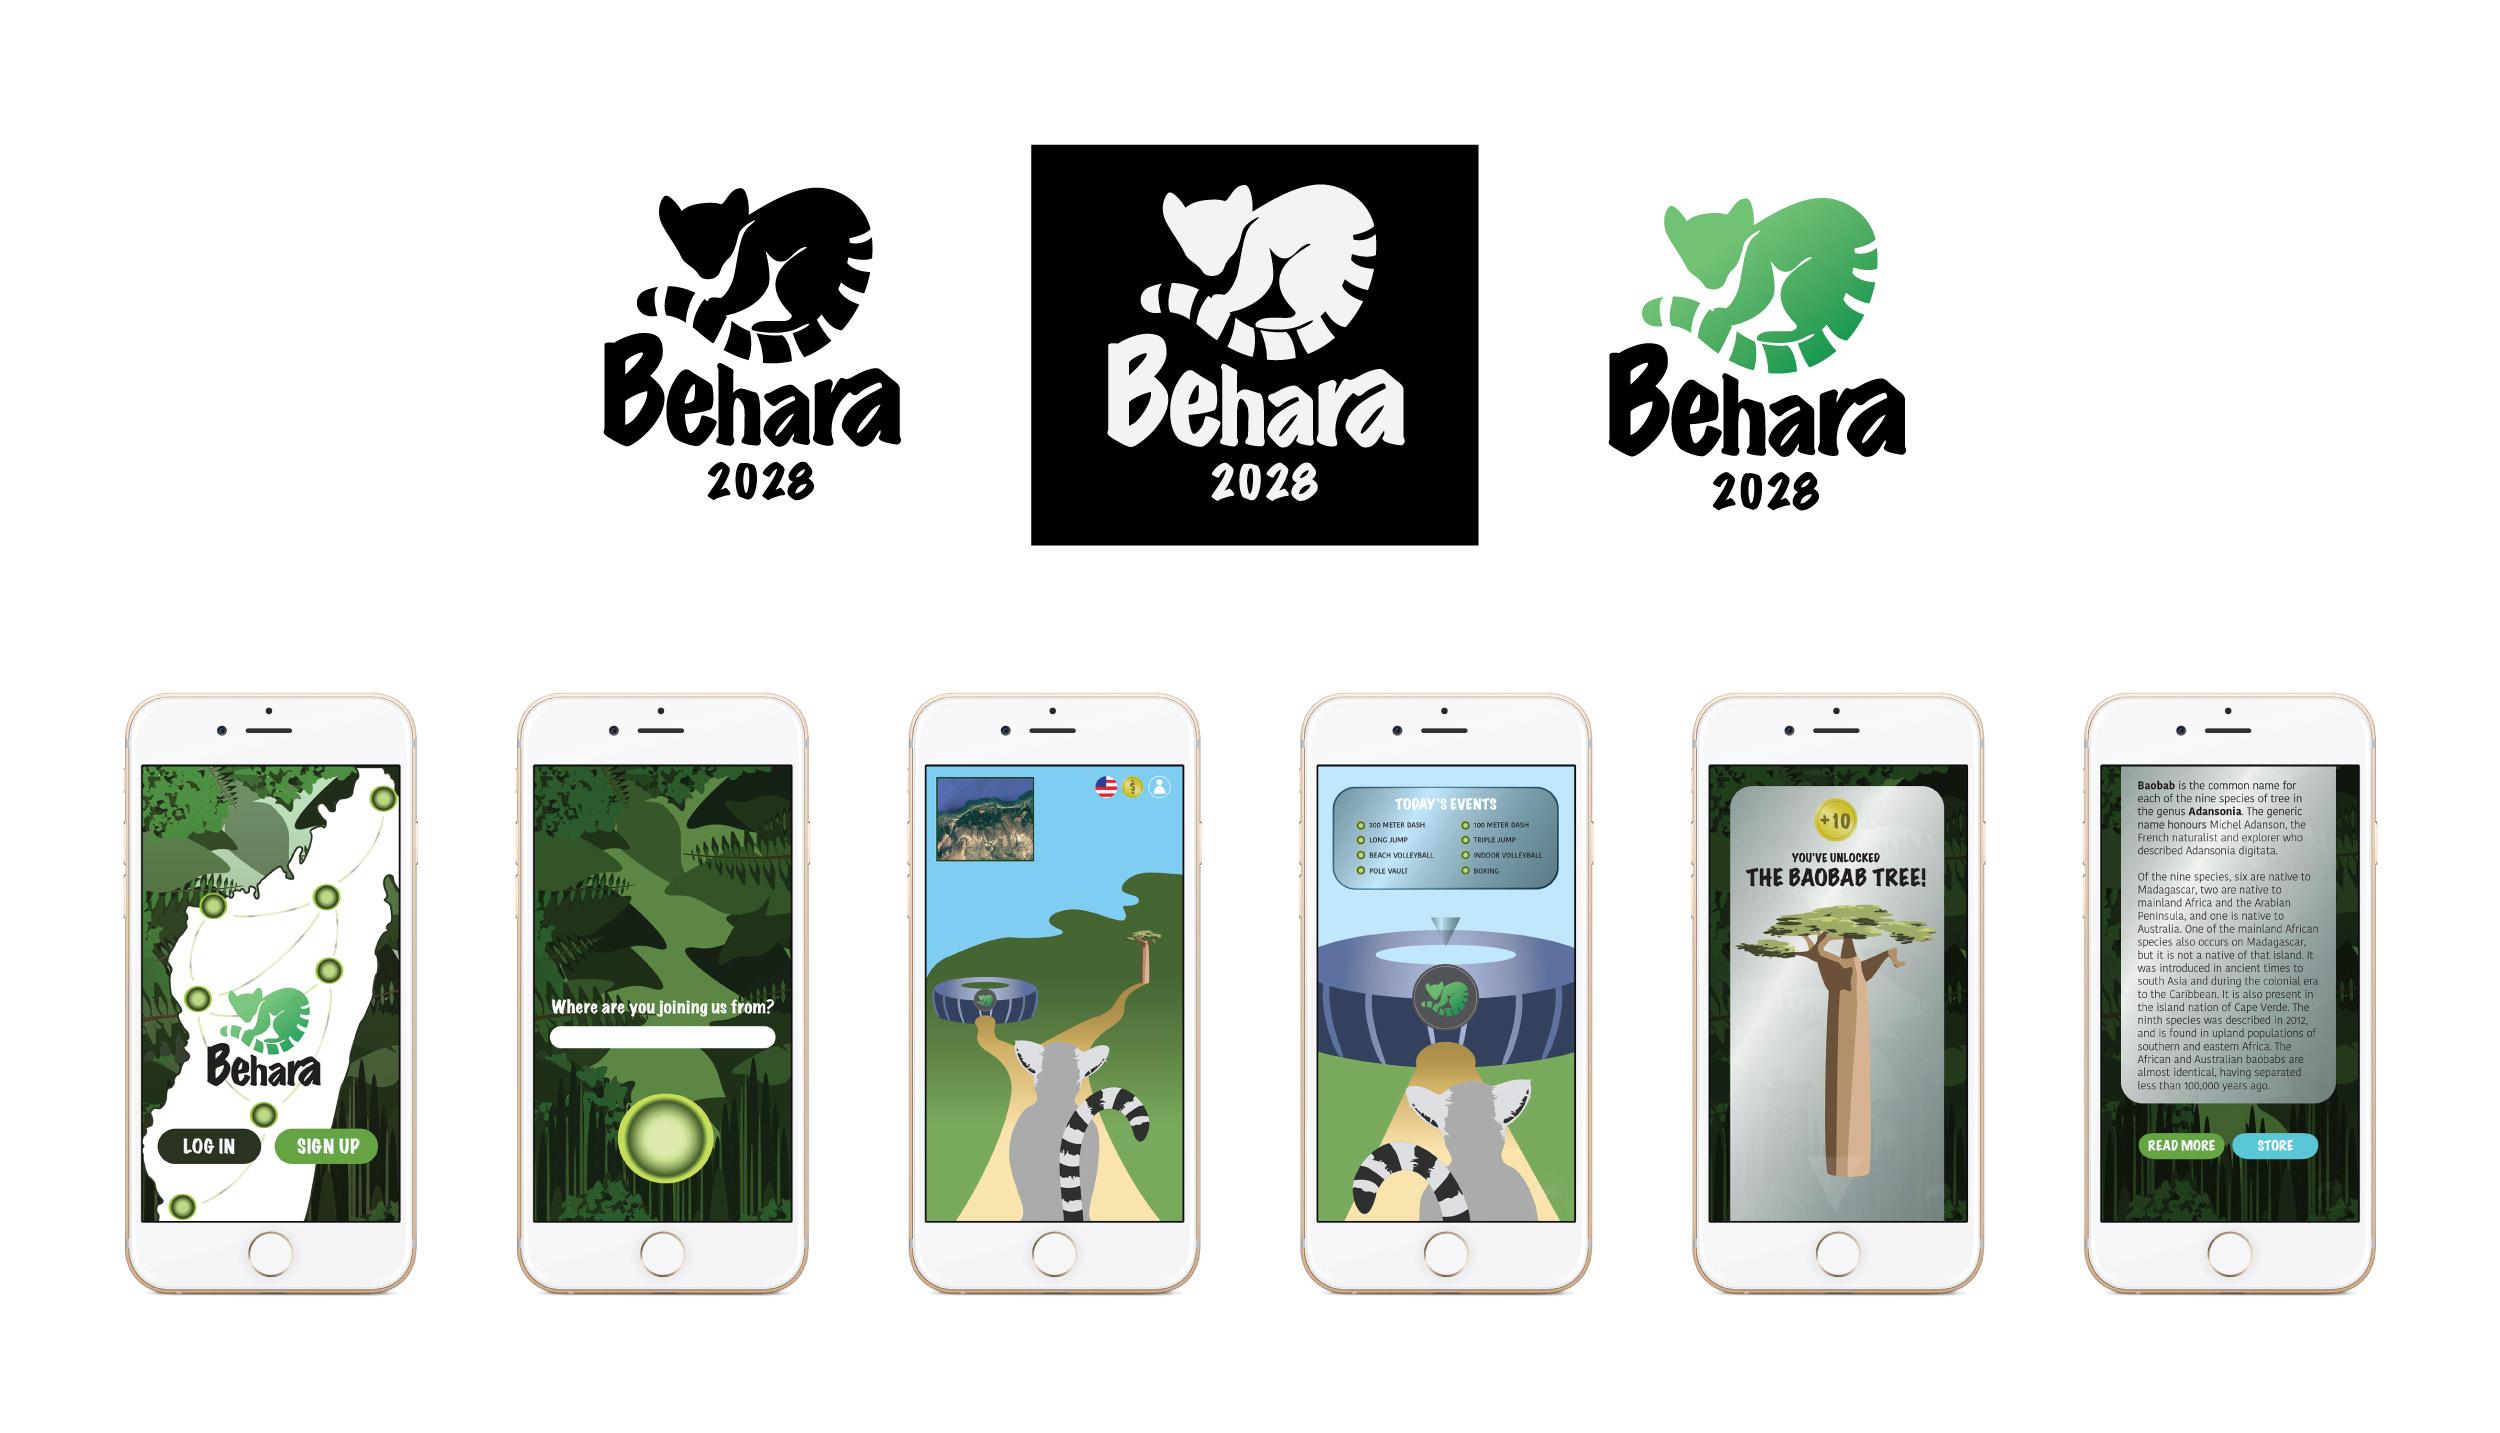 Behara logos and phone app - logo and app illustrations designed using Adobe Illustrator and Photoshop